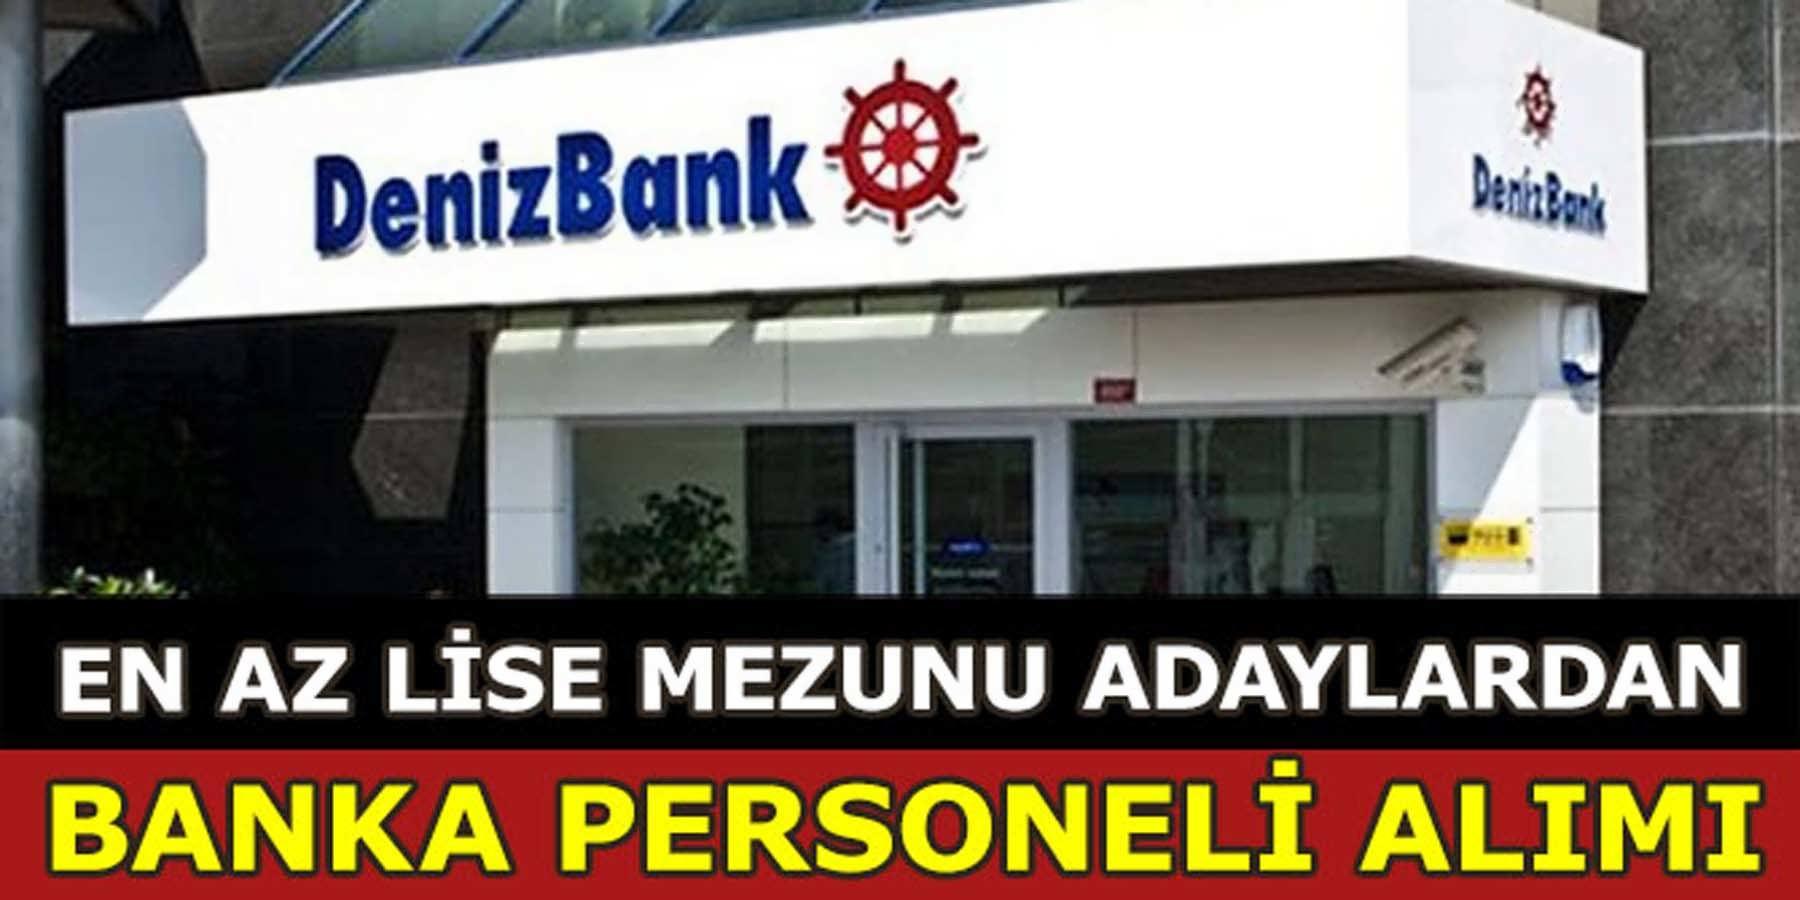 Denizbank Banka'ya Banka Personeli Alımı